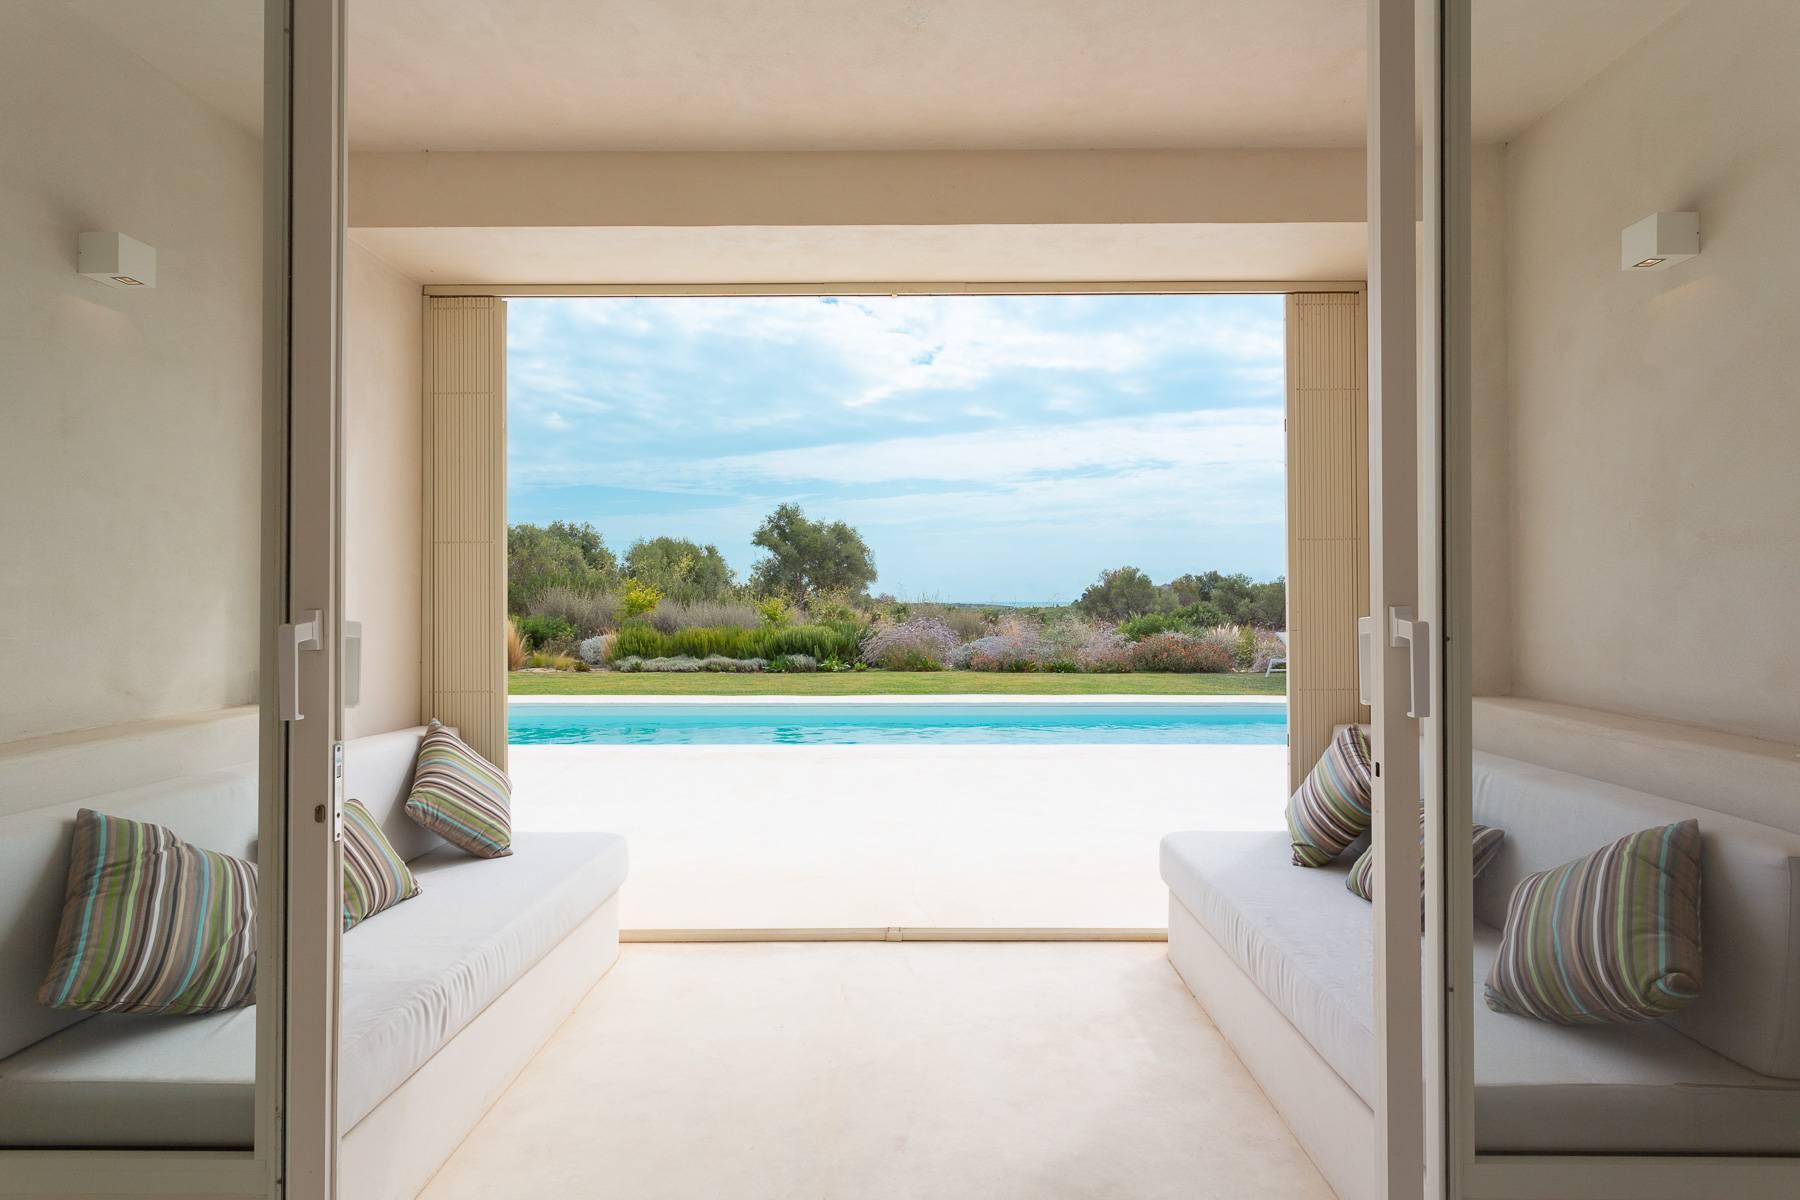 Moderne Villa mit Swimmingpool und Blick auf das Vendicari-Reservat - 1